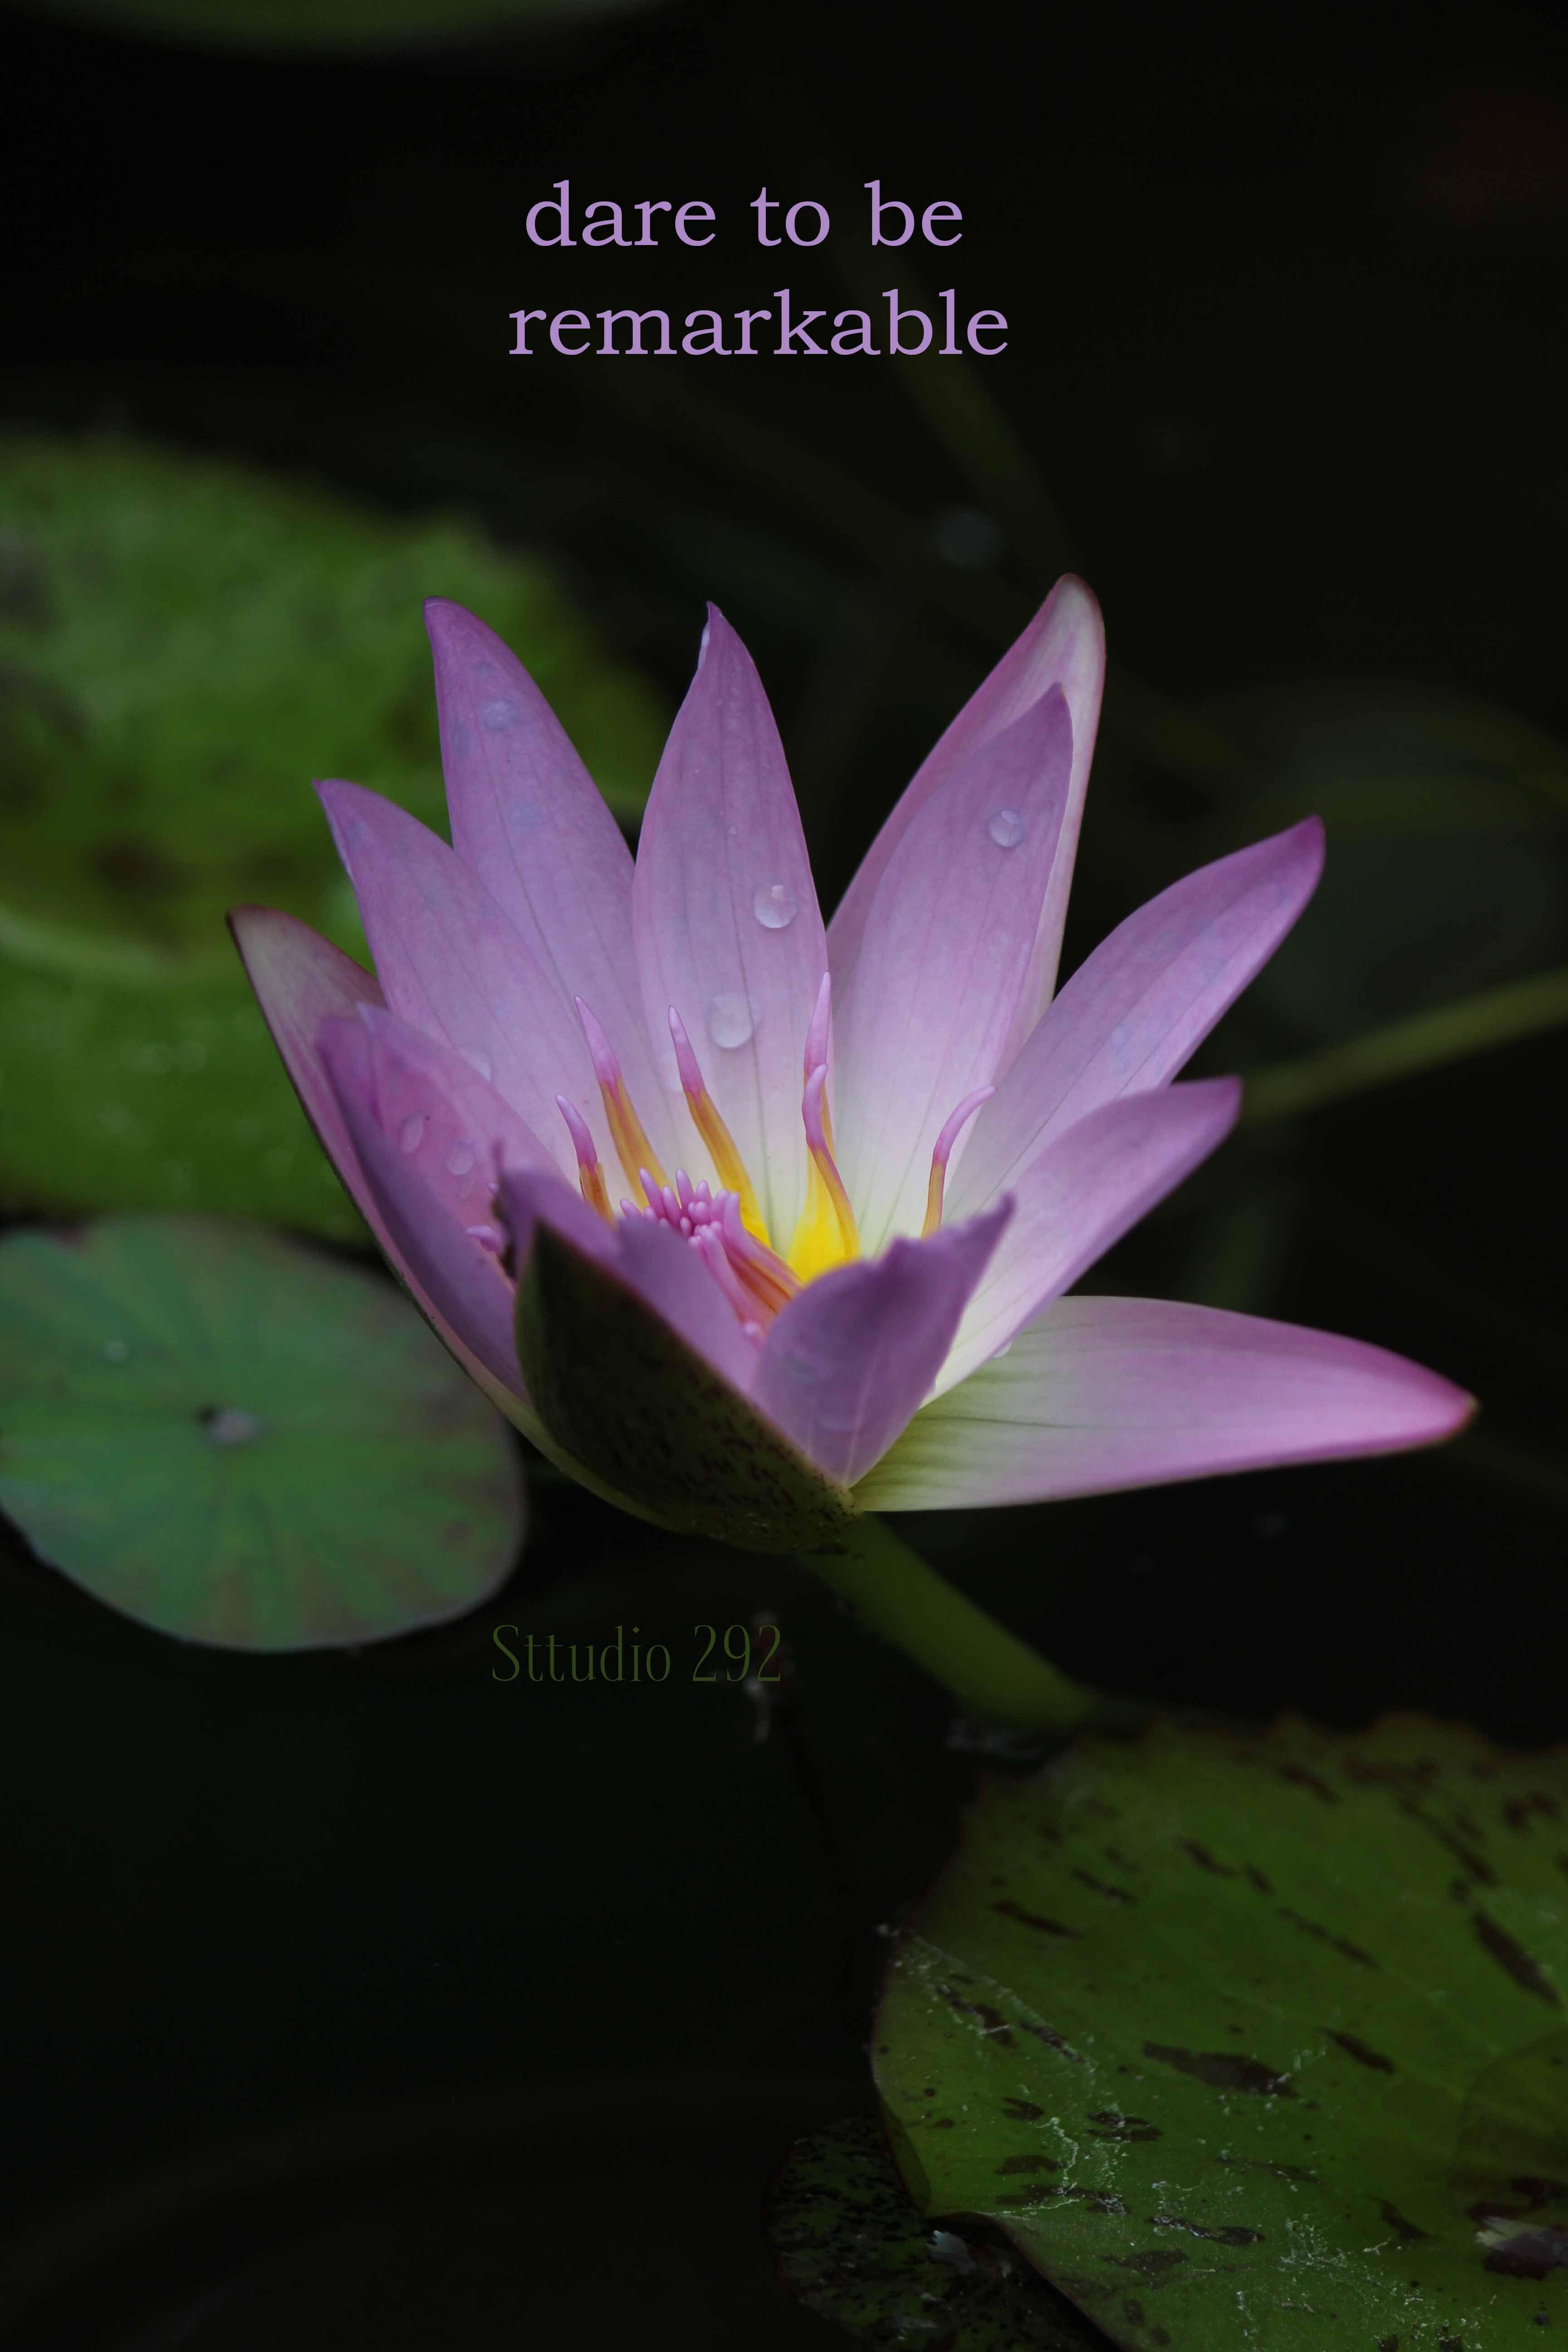 Lotus flowers inspirational quotes for 2018 beautiful flowers lotus flowers inspirational quotes for 2018 beautiful flowers beautiful flowers with quotes izmirmasajfo